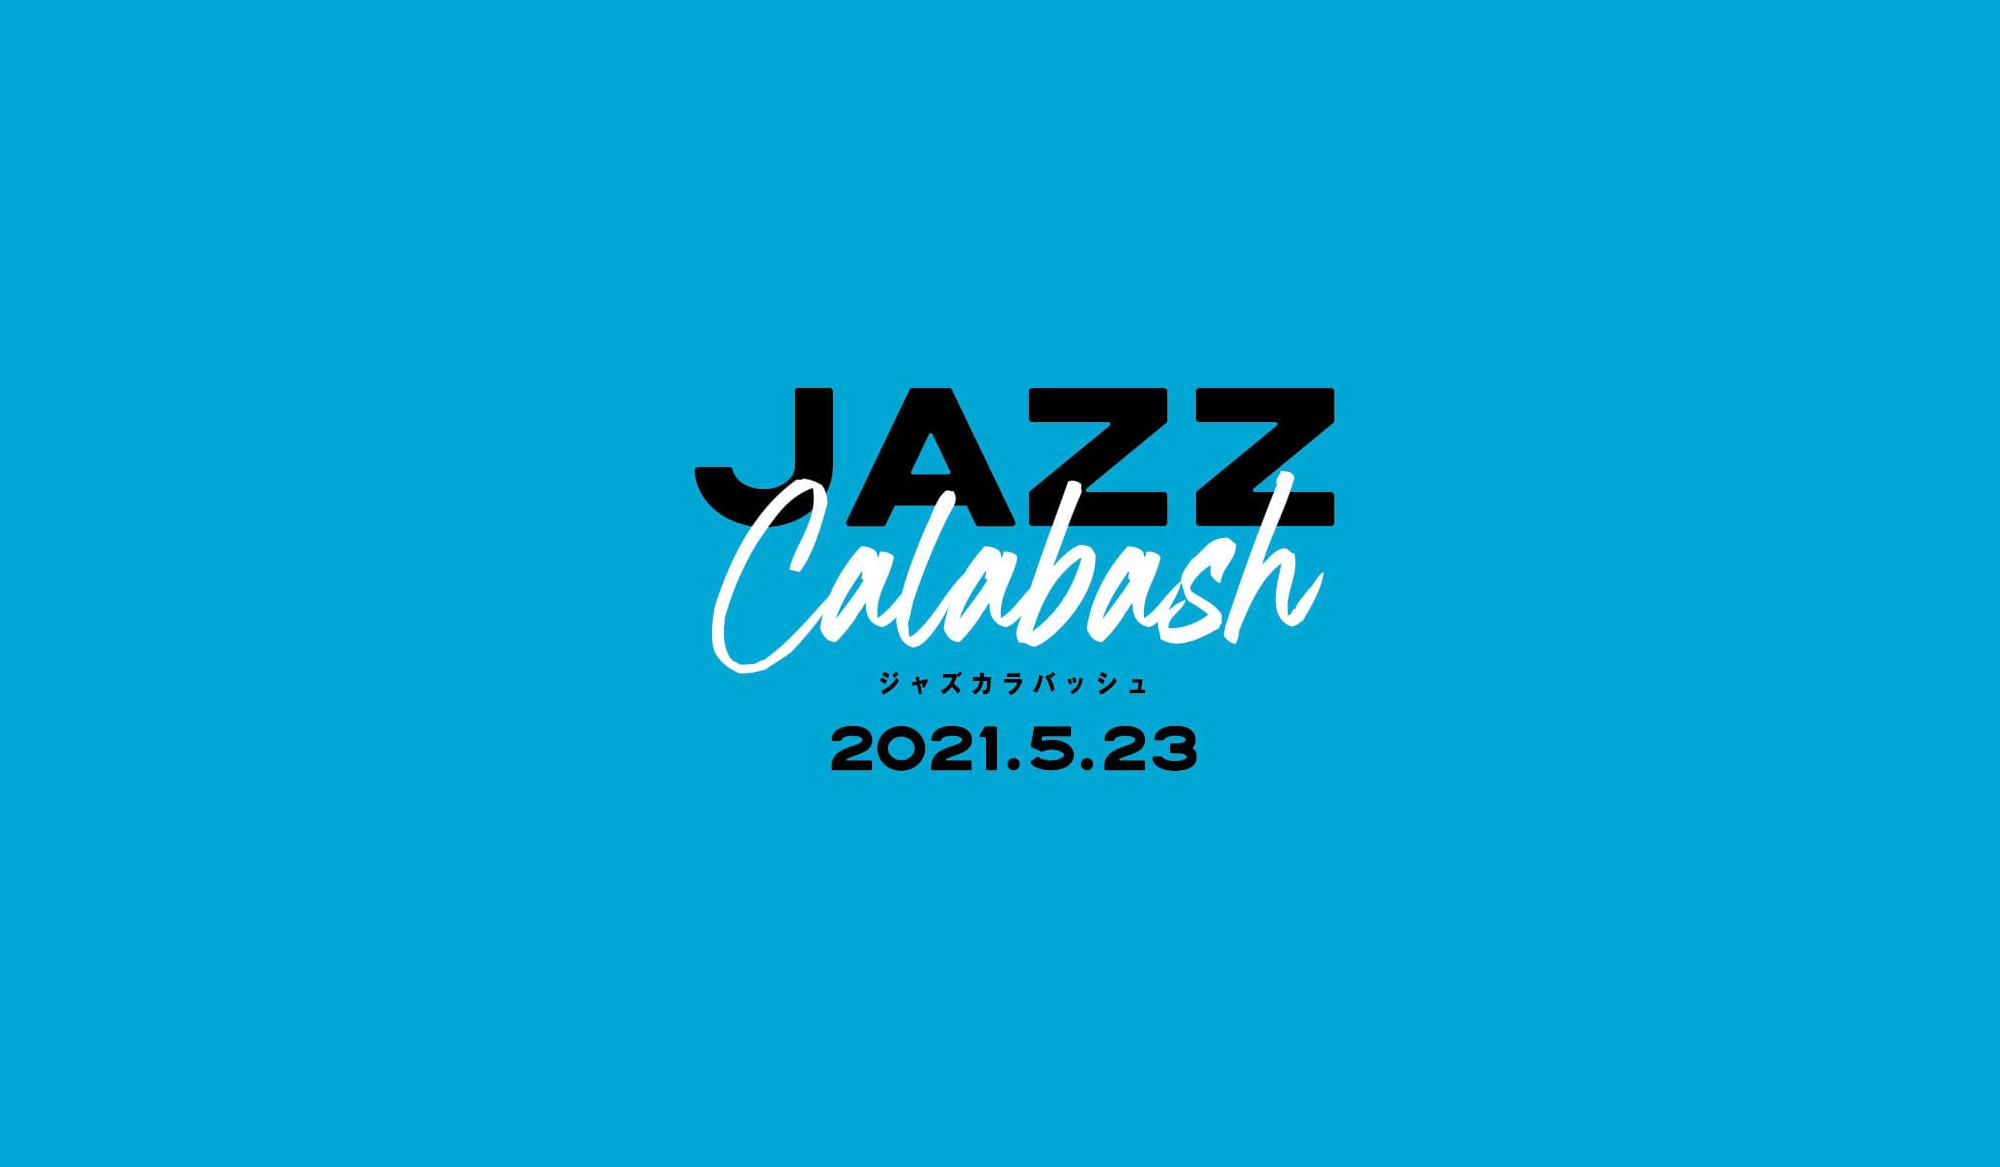 Jazzcalabash